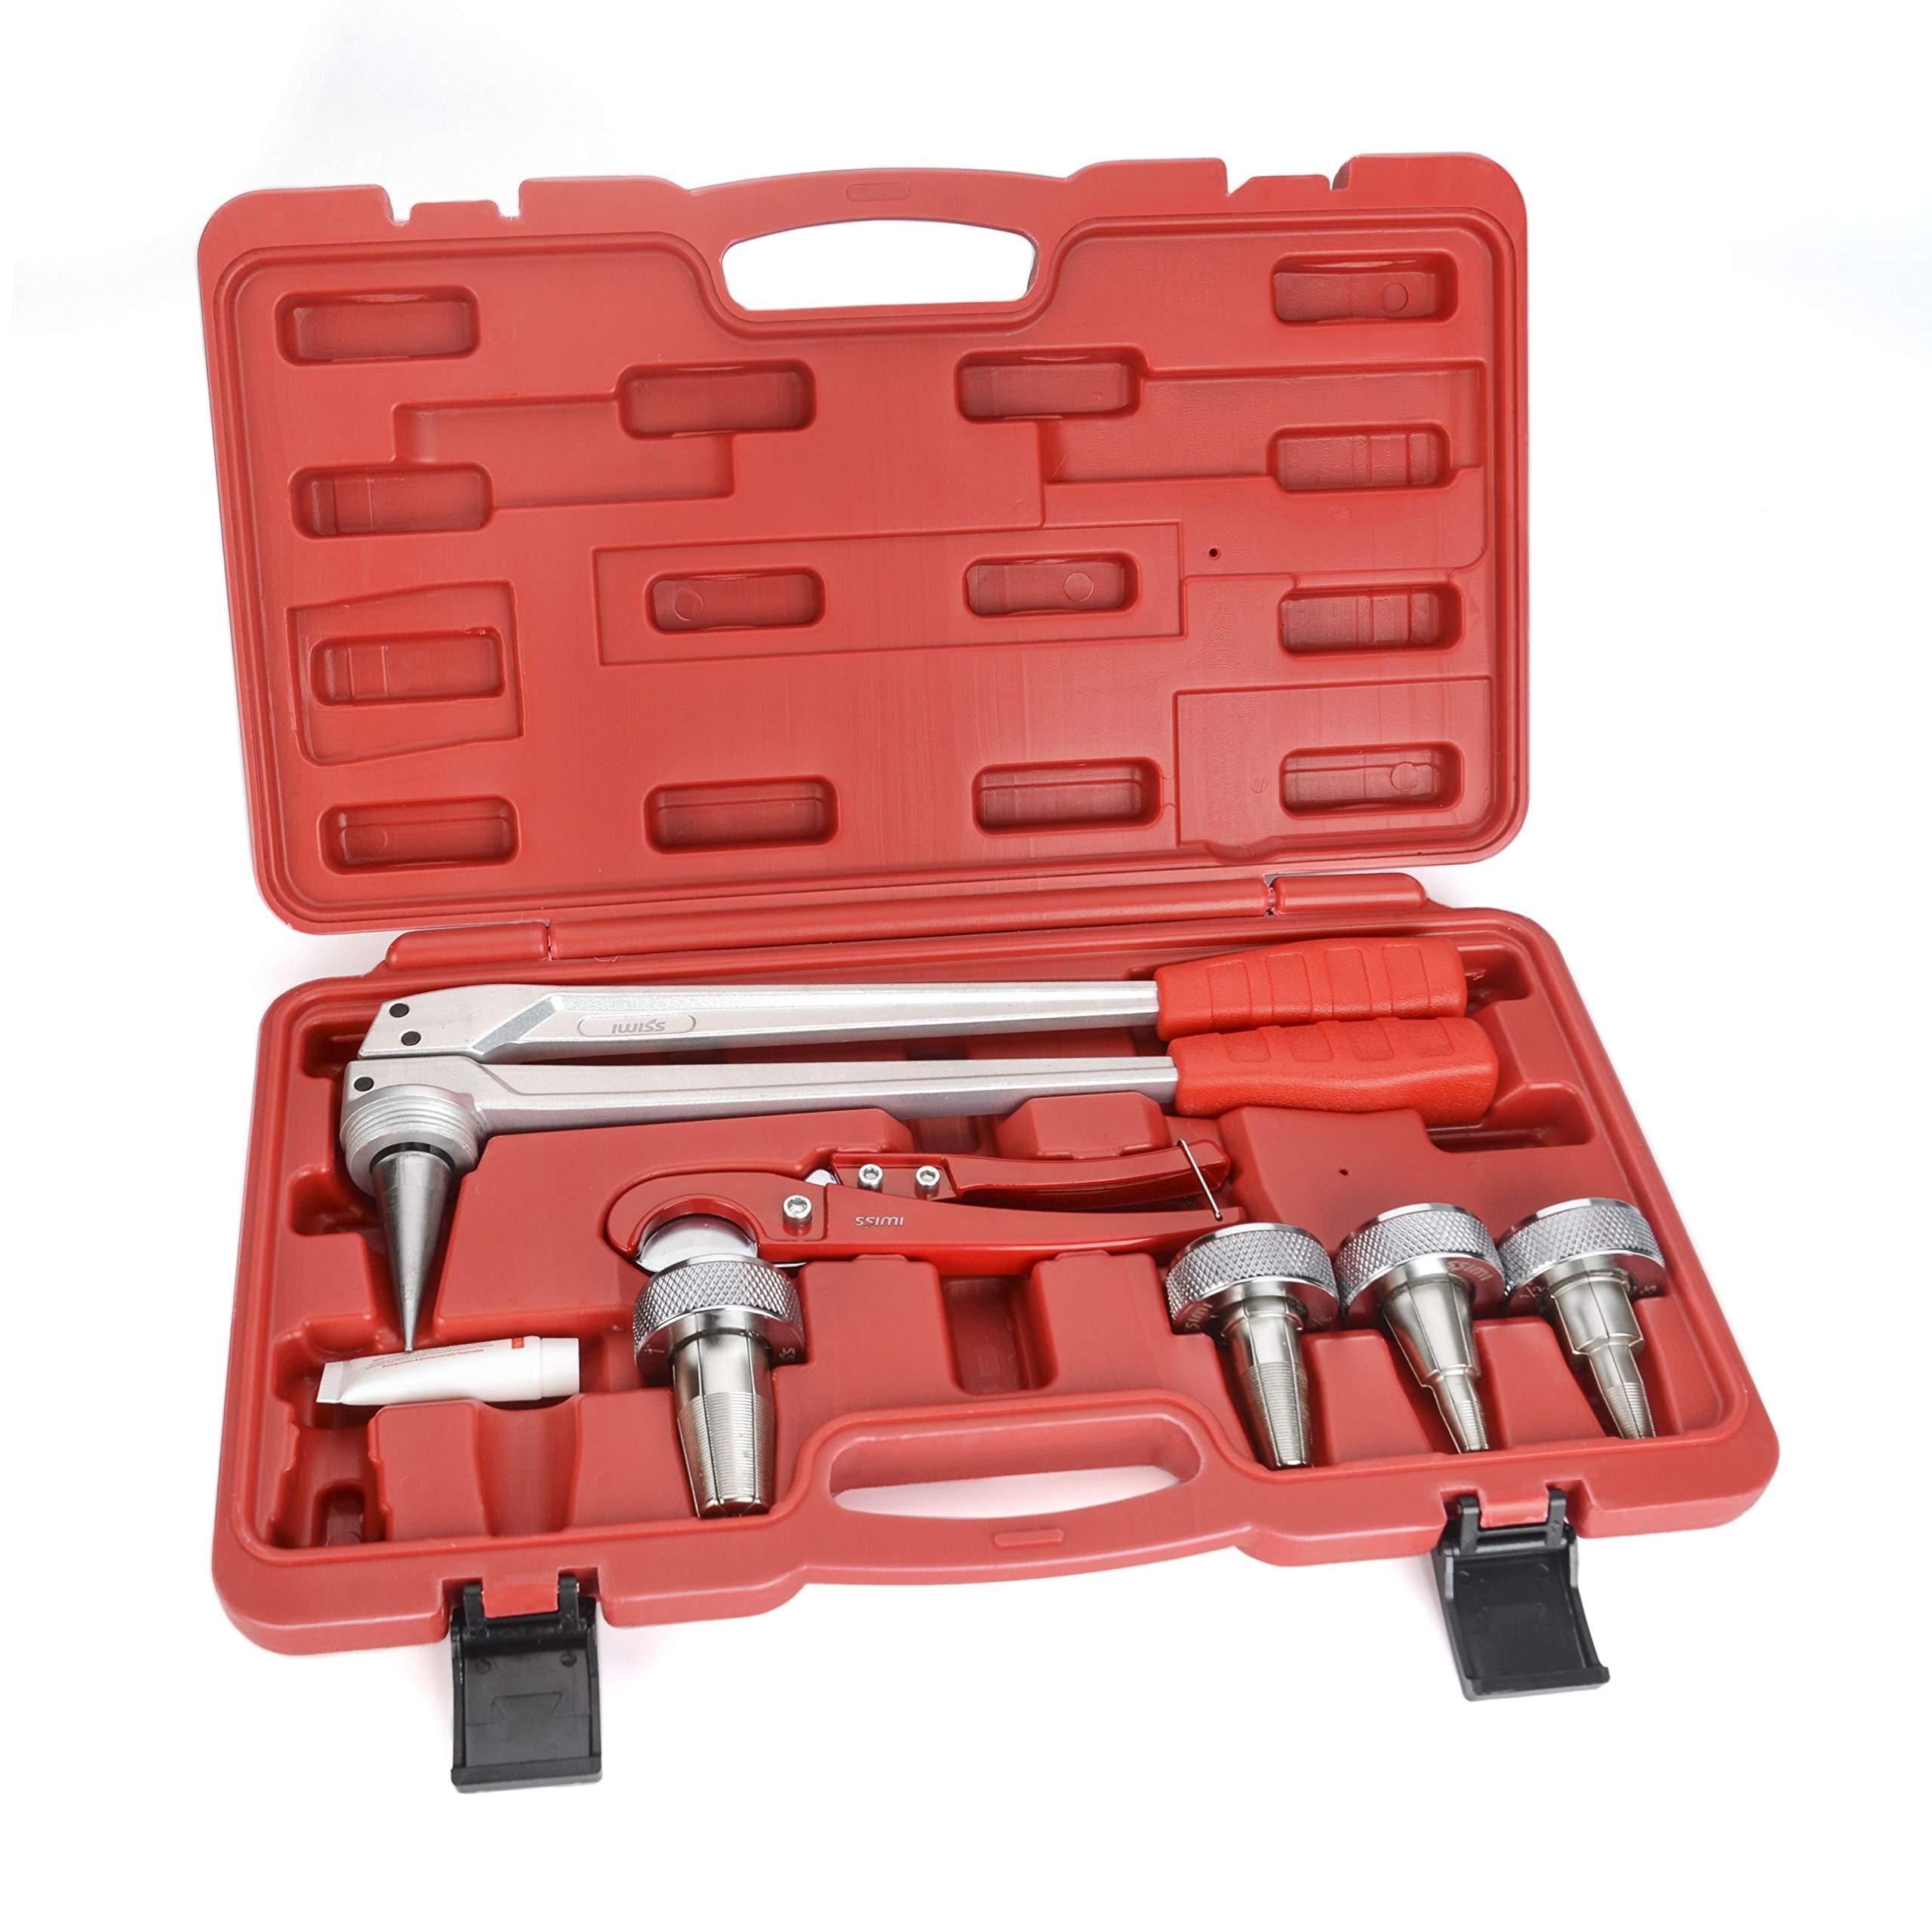 "Manual de expansión de tubería PEX iwiss F1960 Kit de herramientas con cabezas de expansión de 1//2/"" a 1/"""